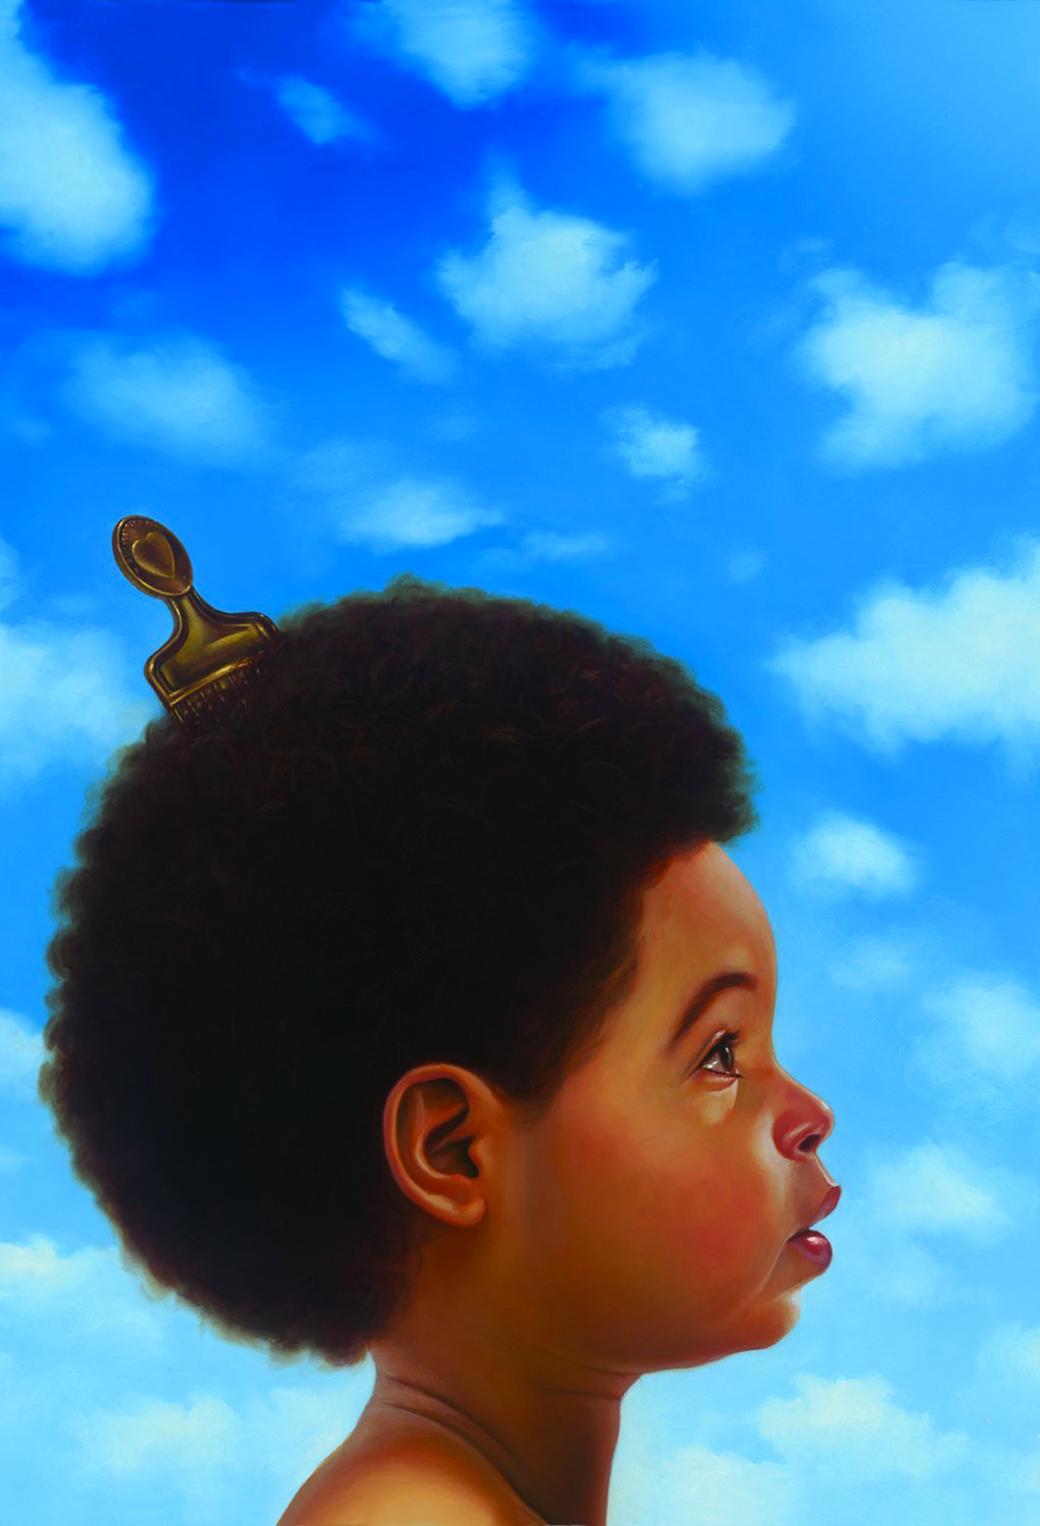 49 Drake Iphone Wallpaper On Wallpapersafari